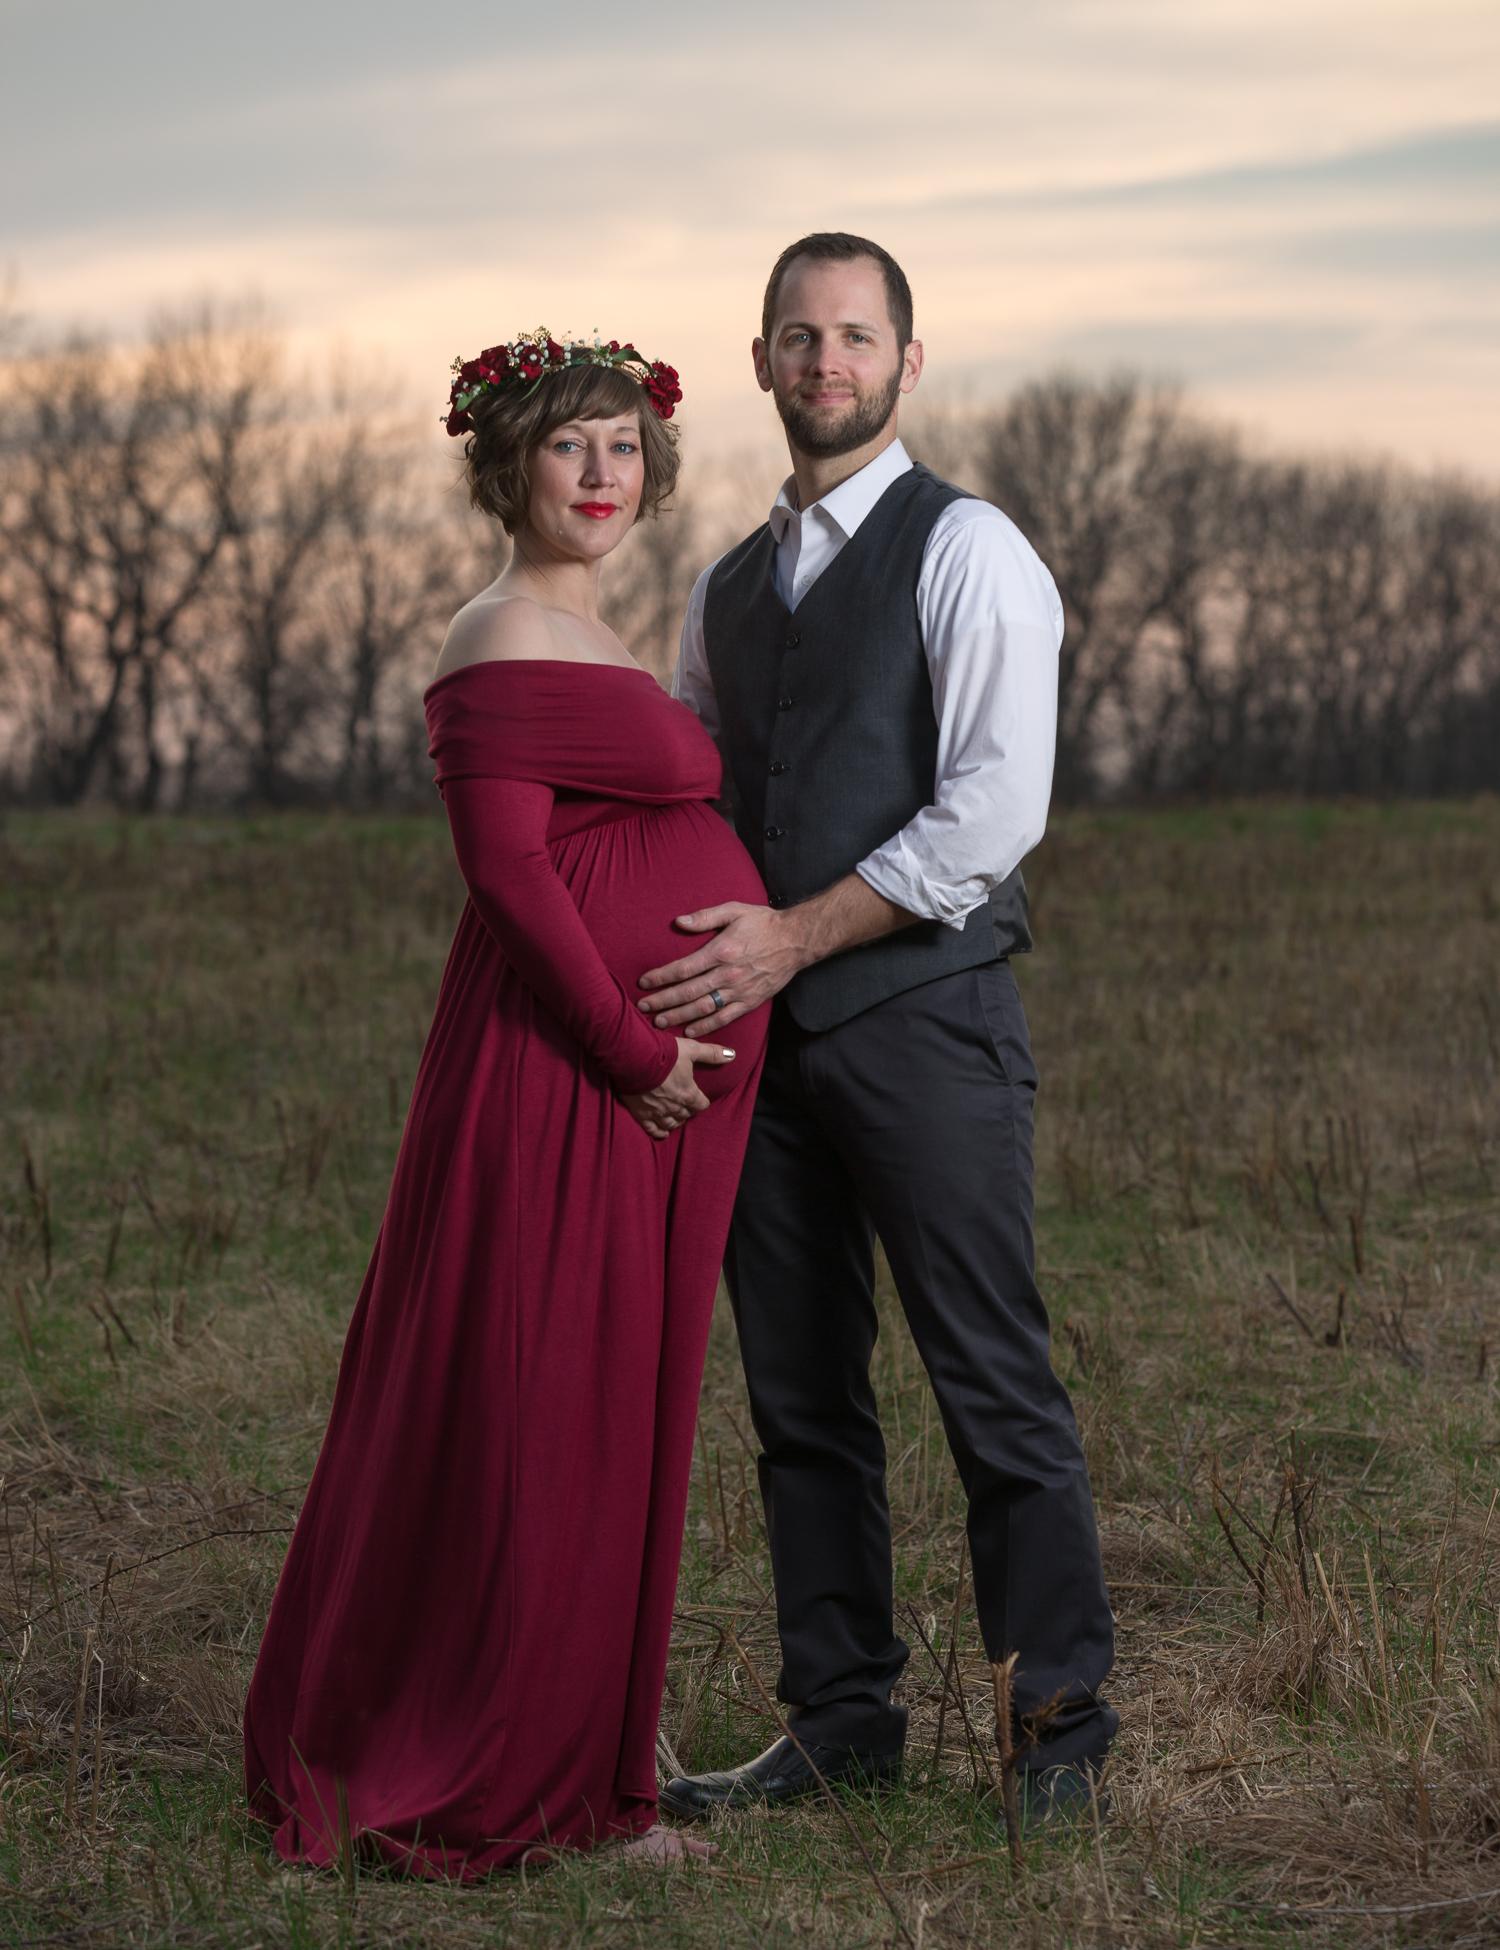 Benson maternity  - | Anthem Photography | wwww.anthem-photo.com | 001.jpg